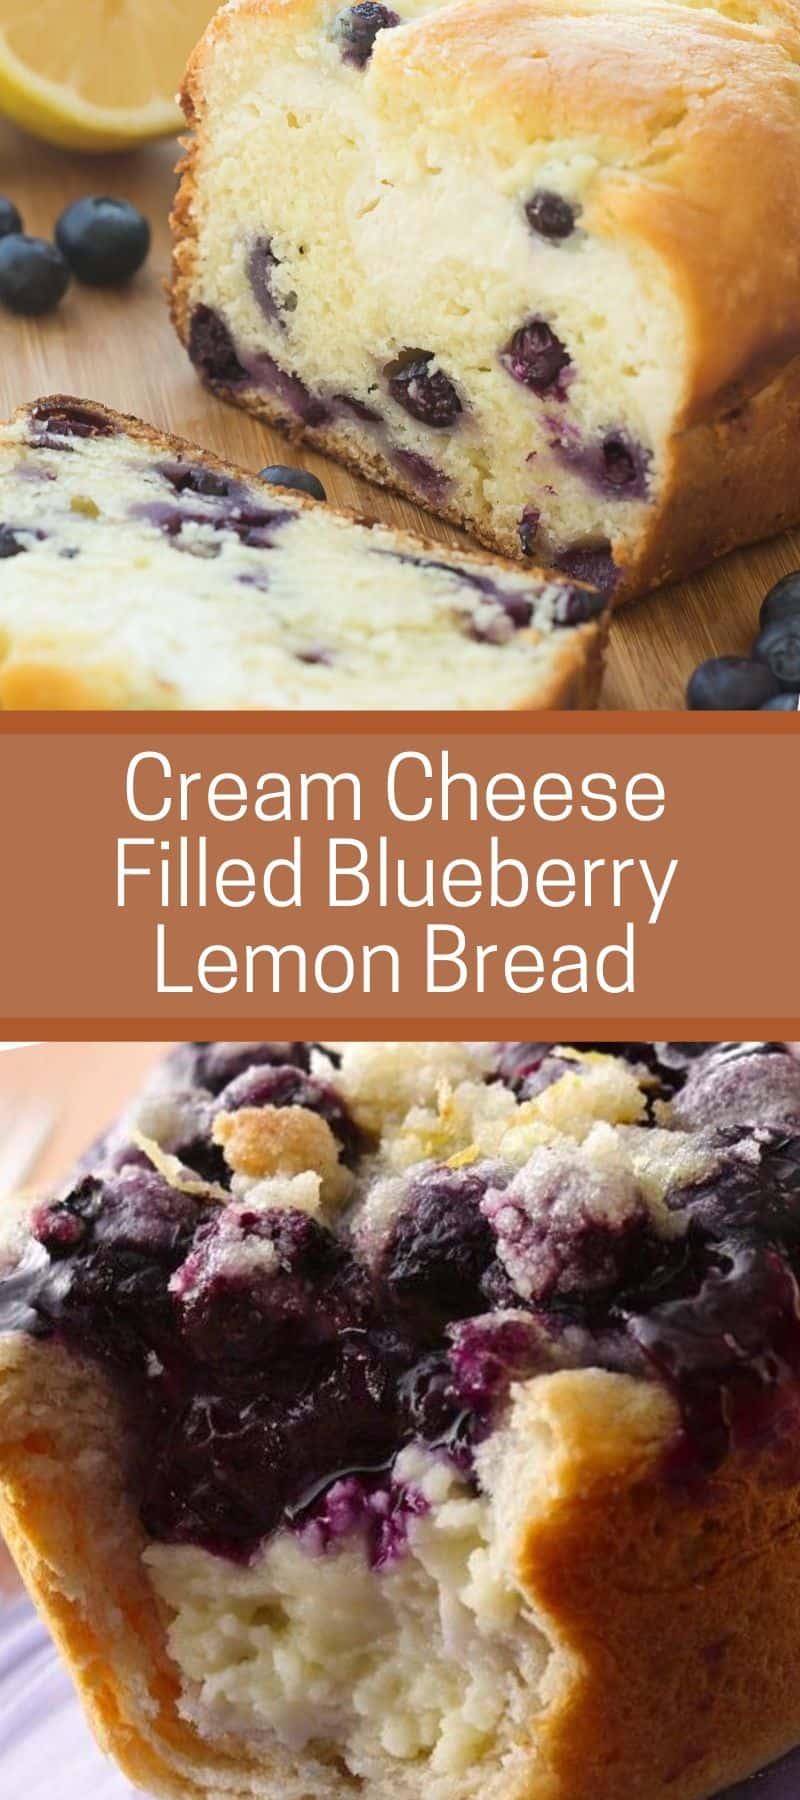 Cream Cheese Filled Blueberry Lemon Bread 3